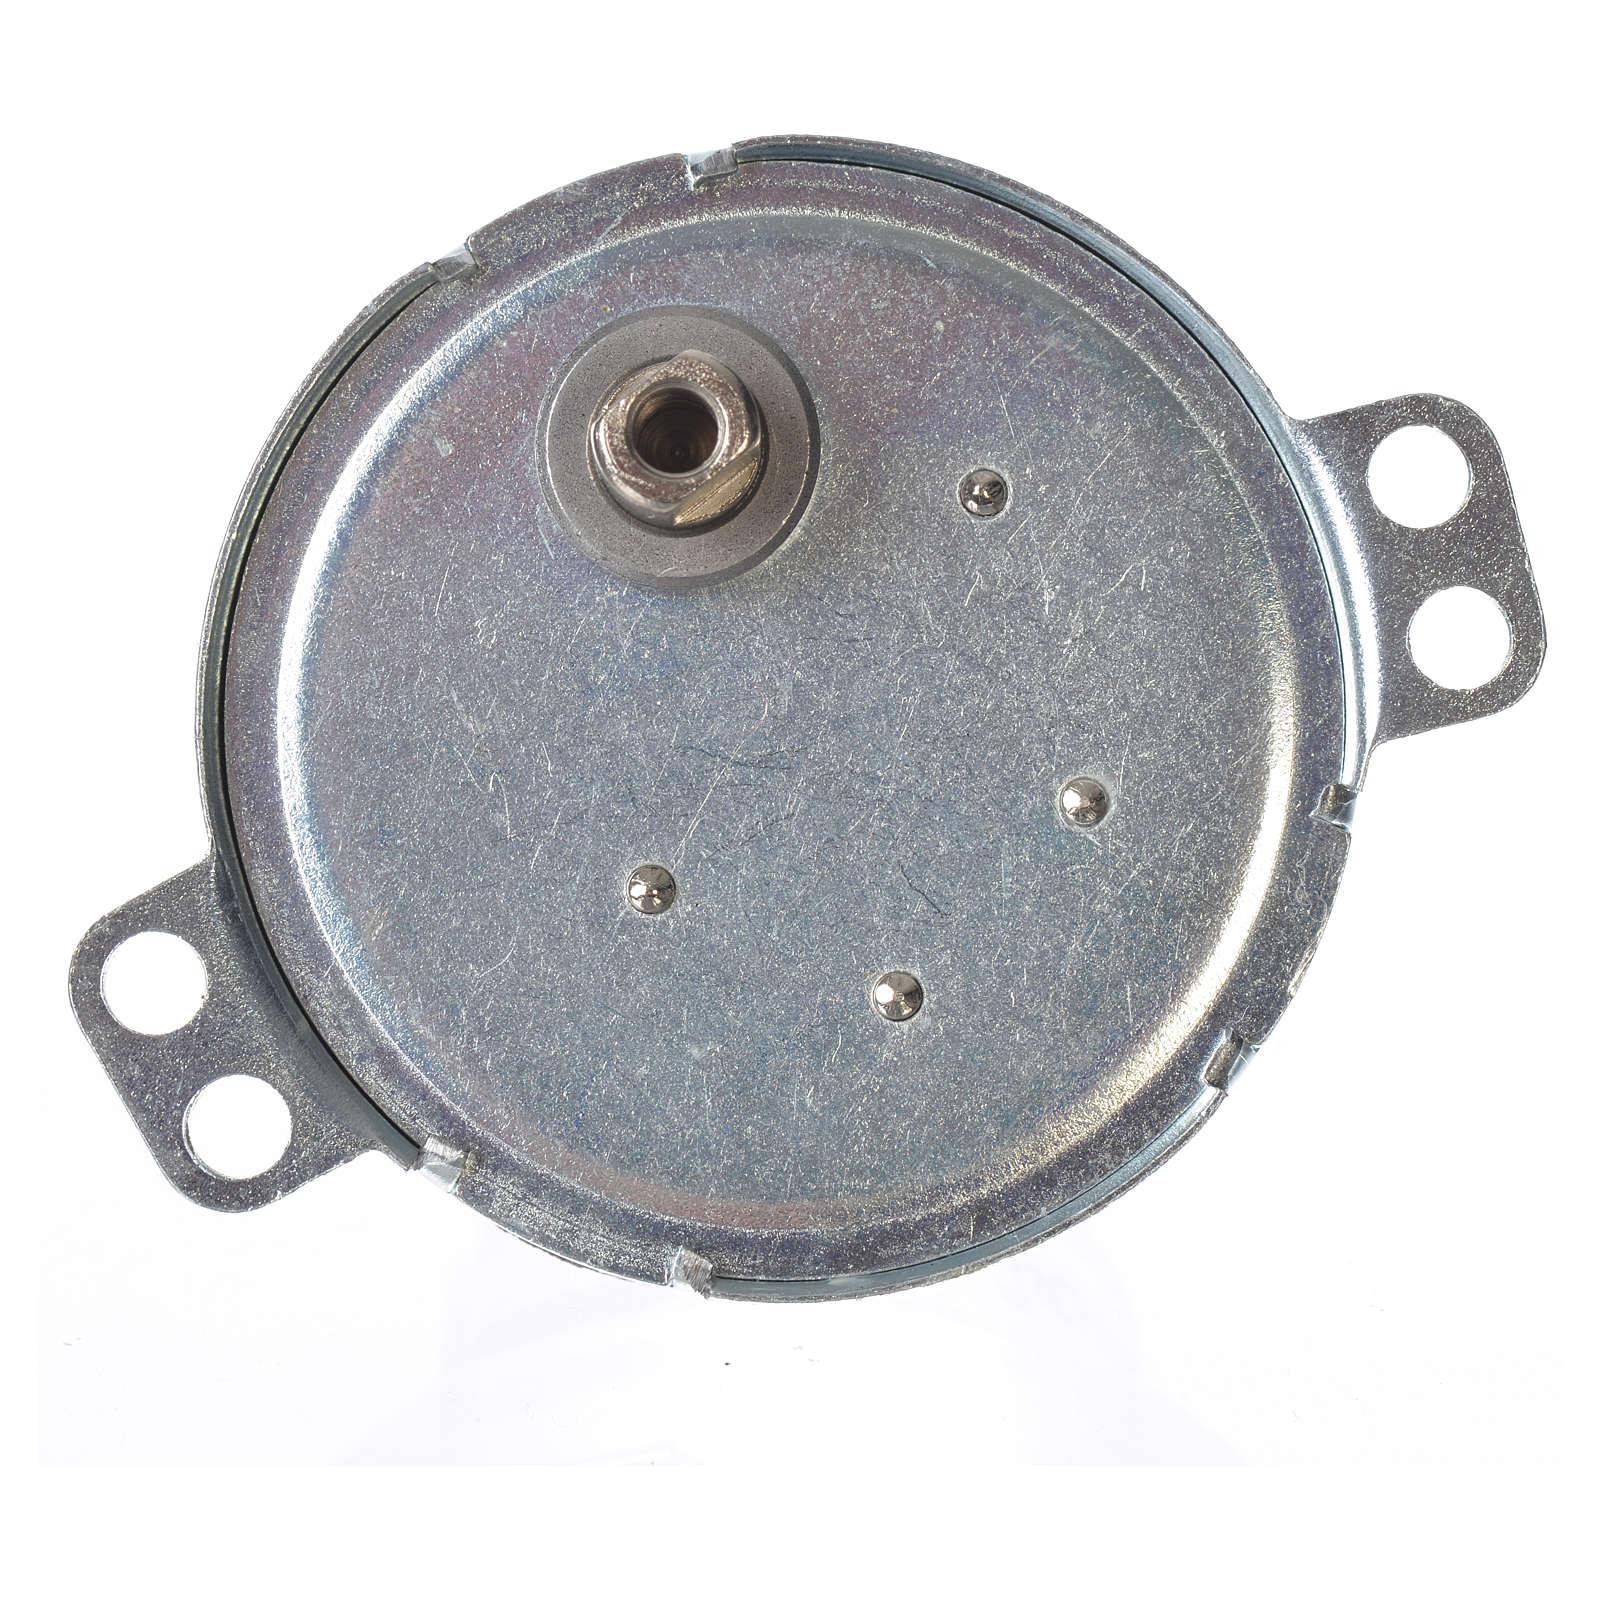 Motoriduttore MECC presepe 20 giri/min 4